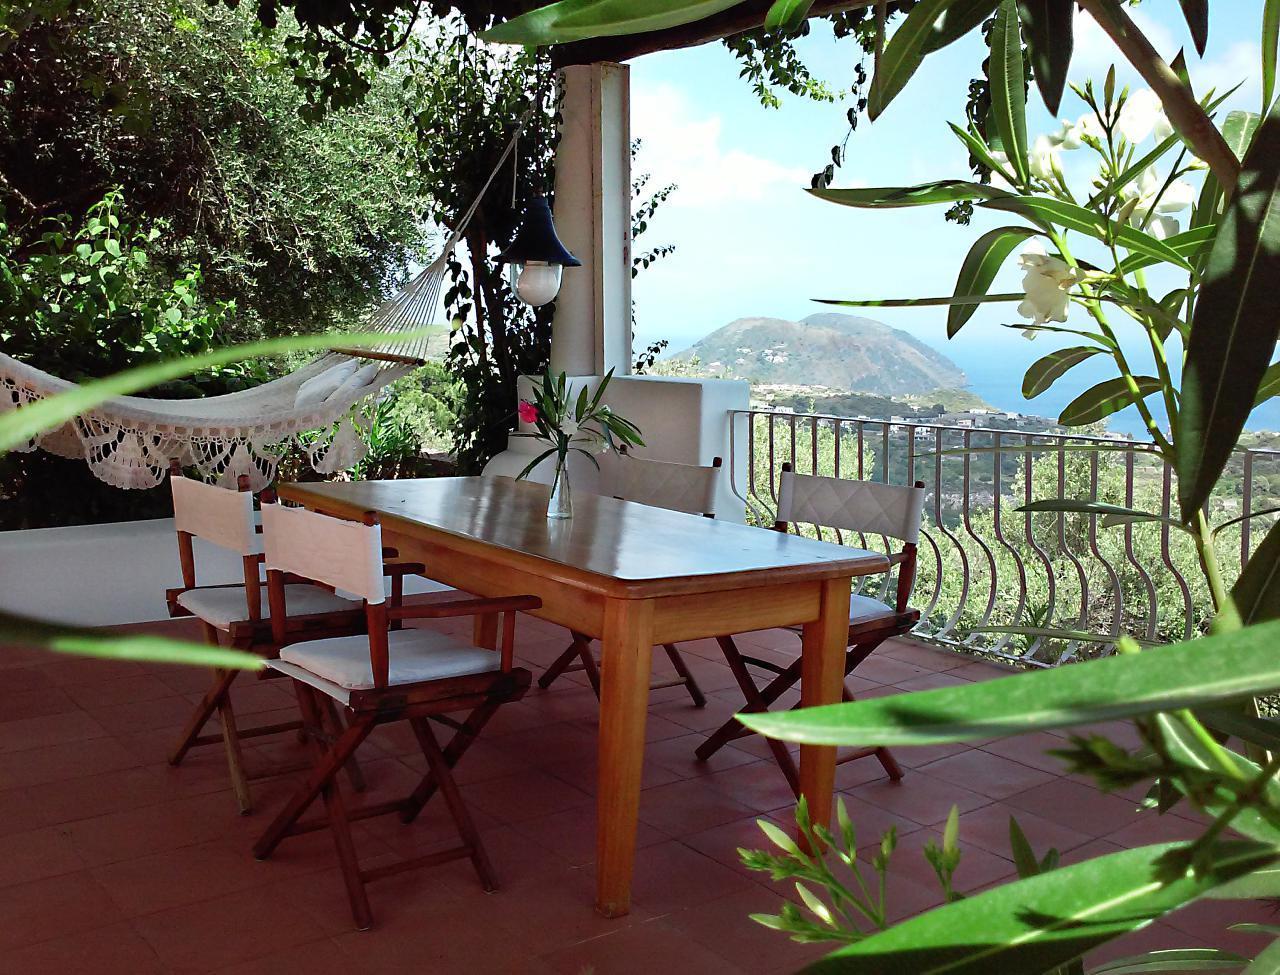 Maison de vacances Ferienhaushälfte Solandra auf sizilianischer Insel mit atemberaubenden Meeres-Rundblick (2038046), Lipari, Lipari, Sicile, Italie, image 31